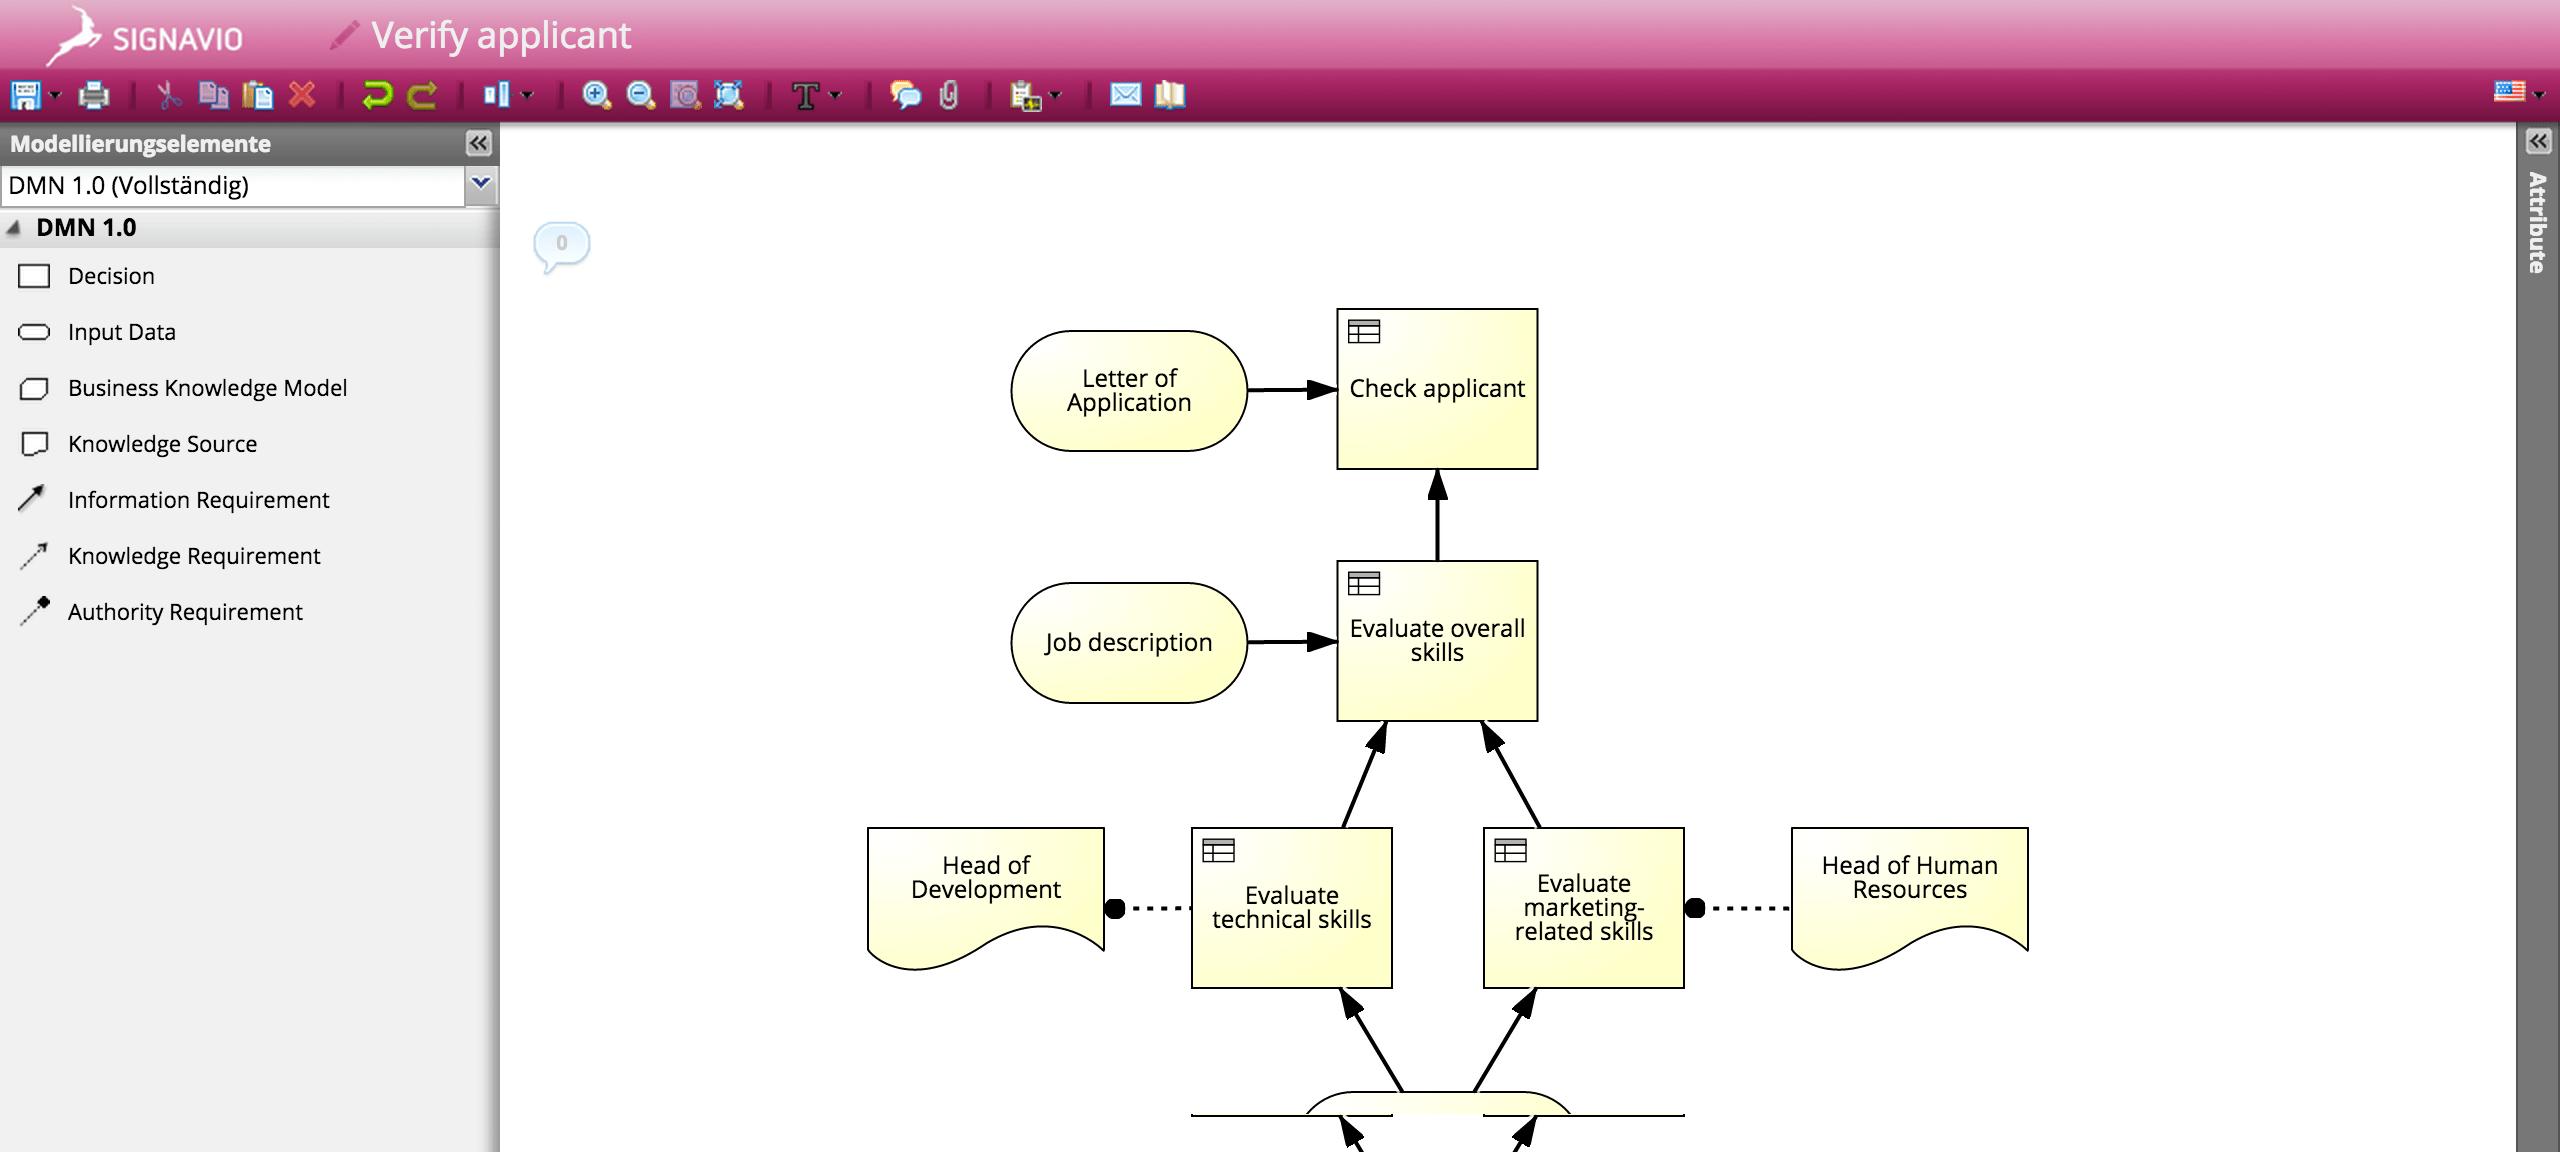 BPM Platform for Process Modeling - Signavio Process Manager